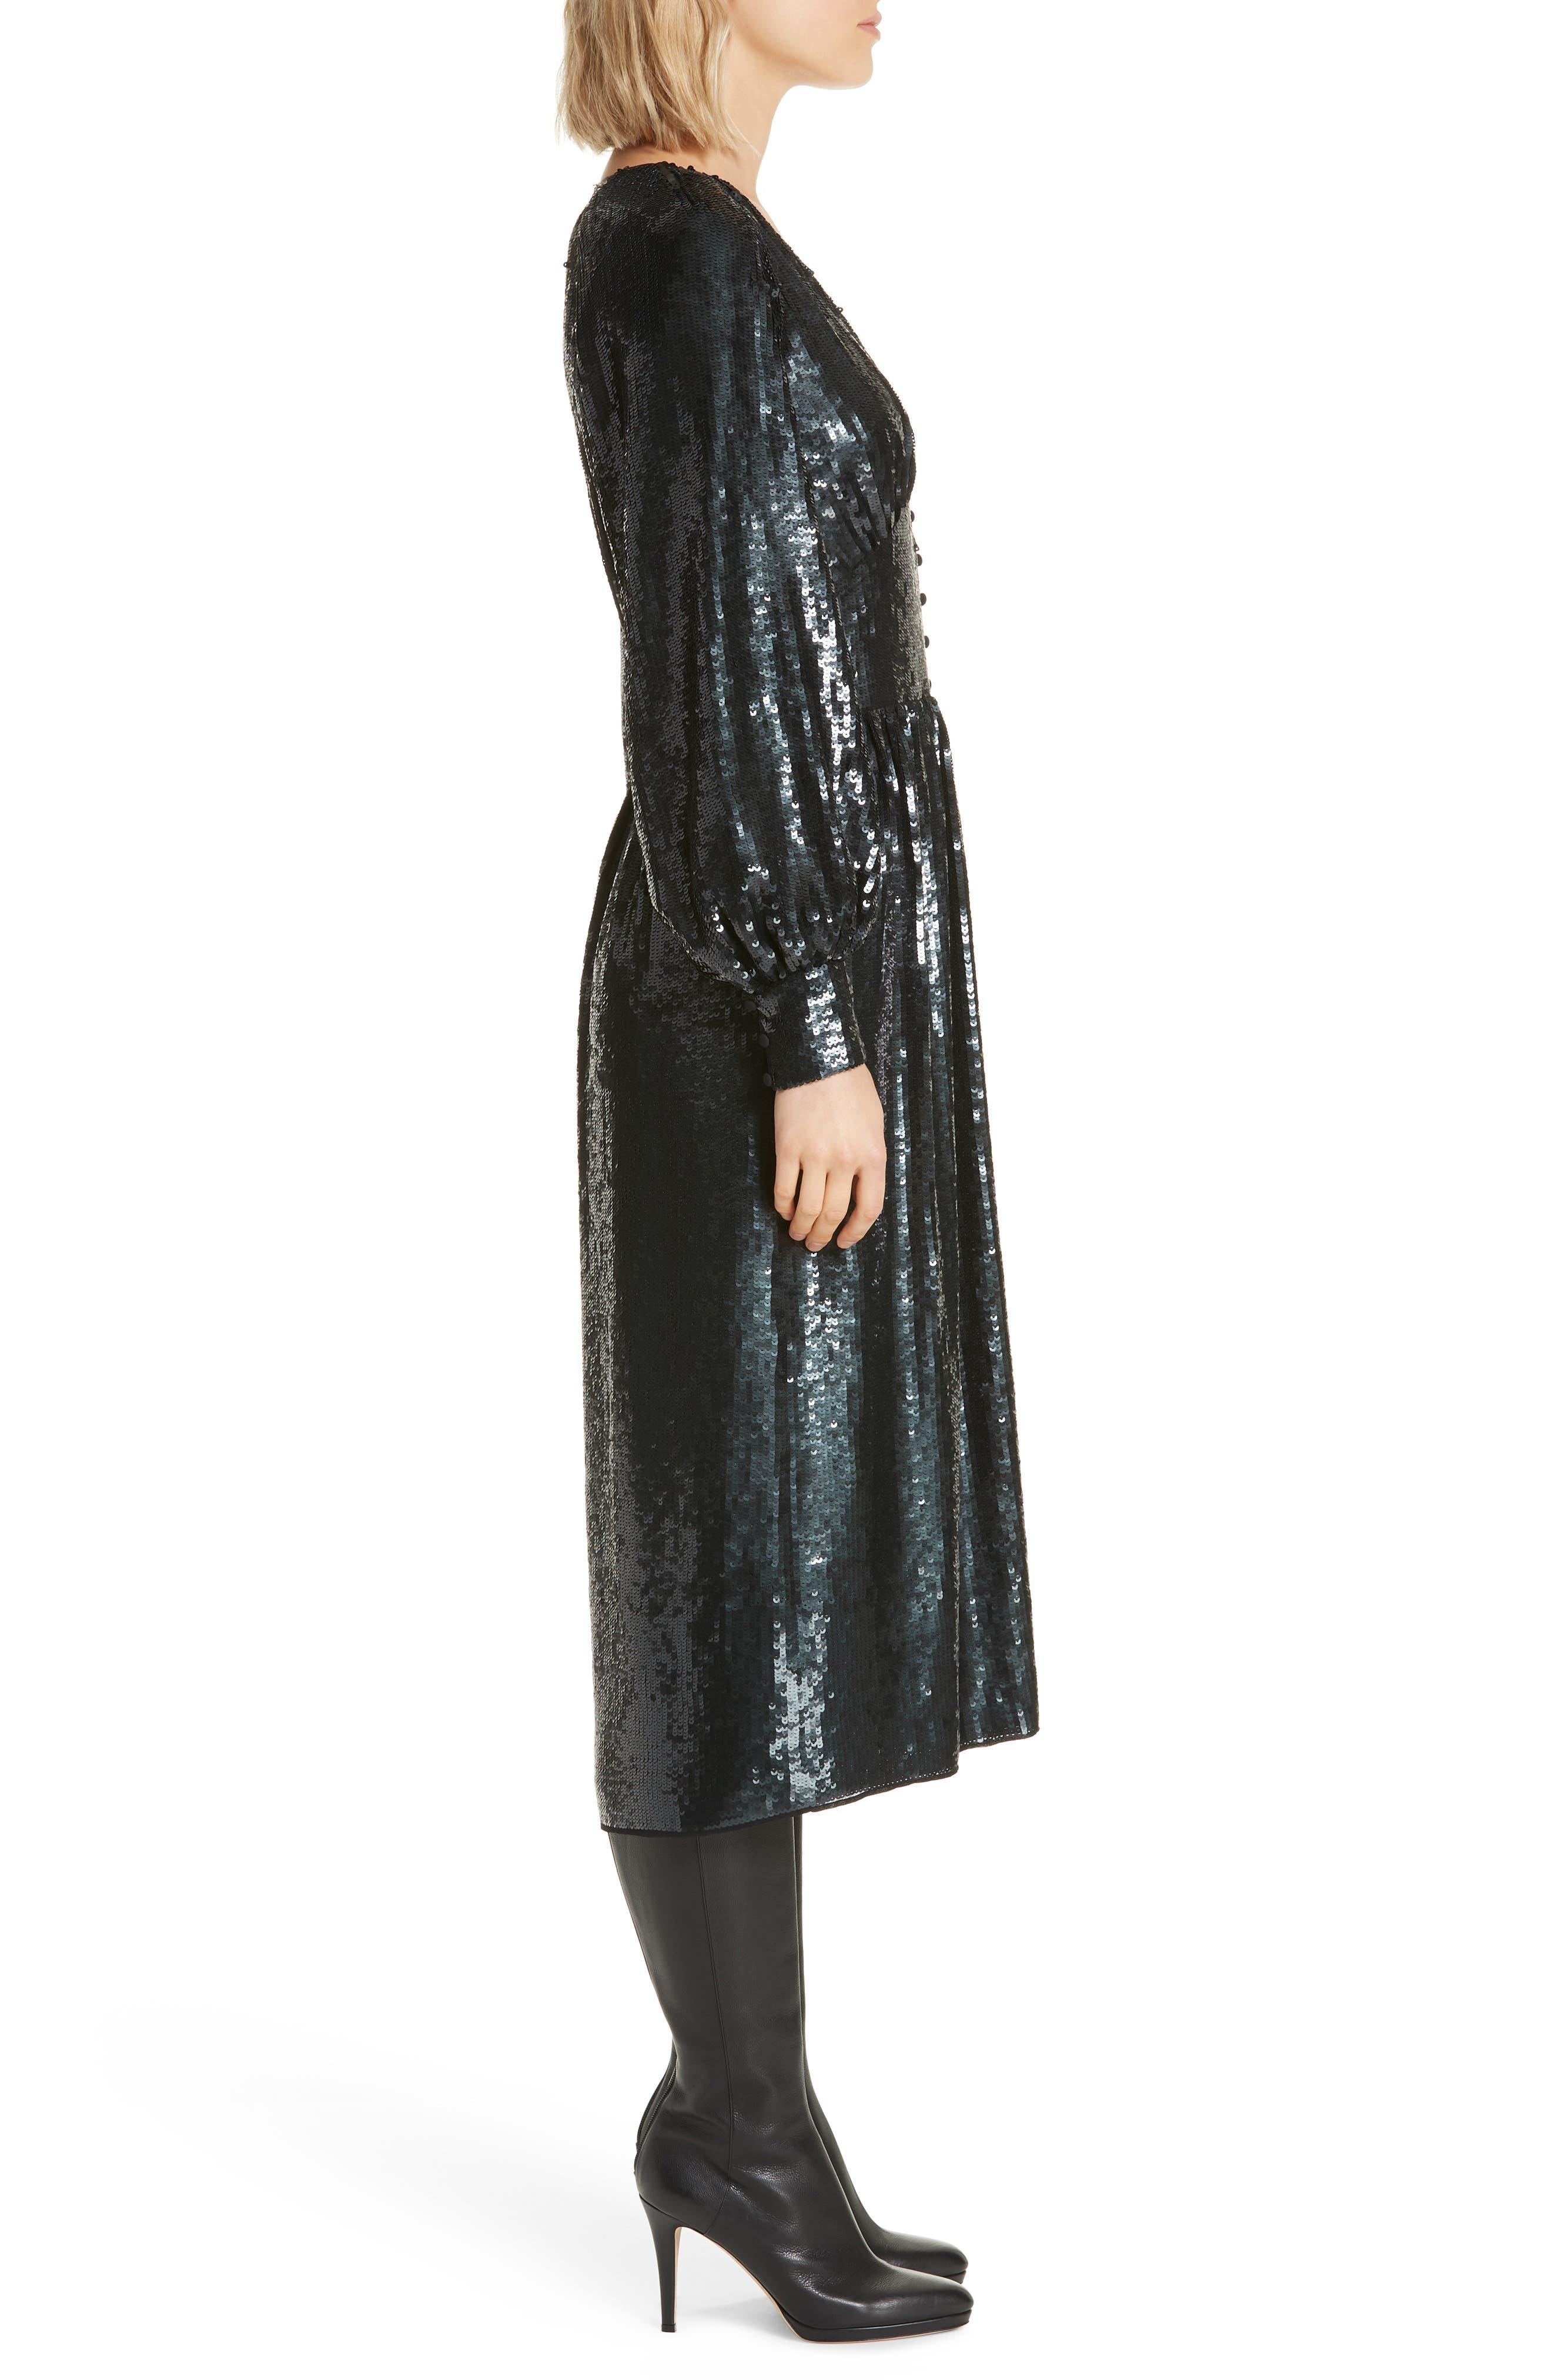 Kyria B Sequin Midi Dress,                             Alternate thumbnail 3, color,                             001